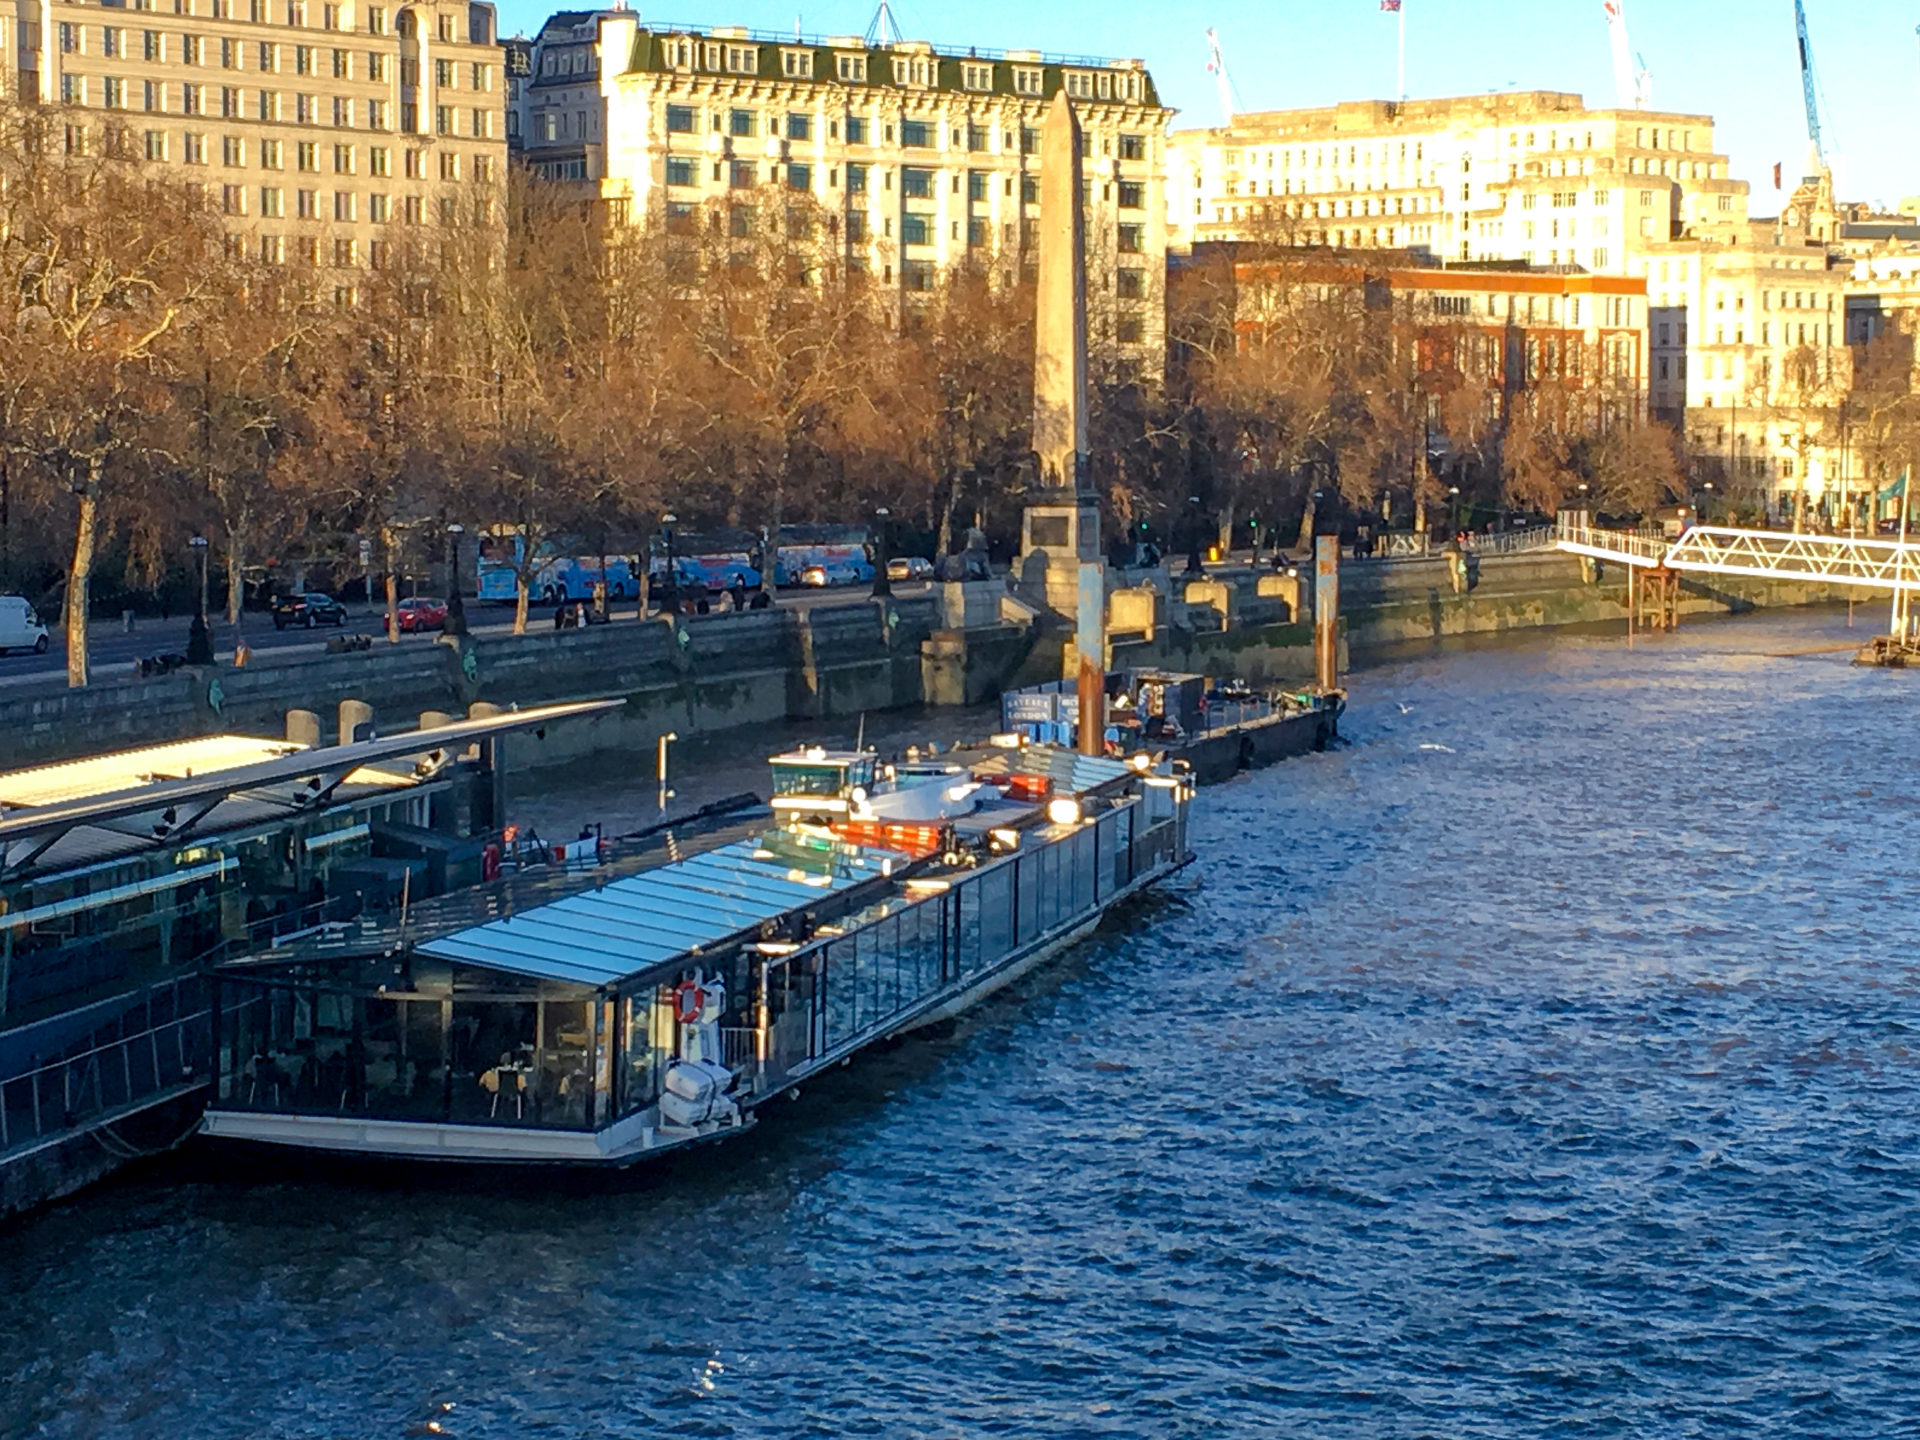 The Symphony -Bateaux London Cruise